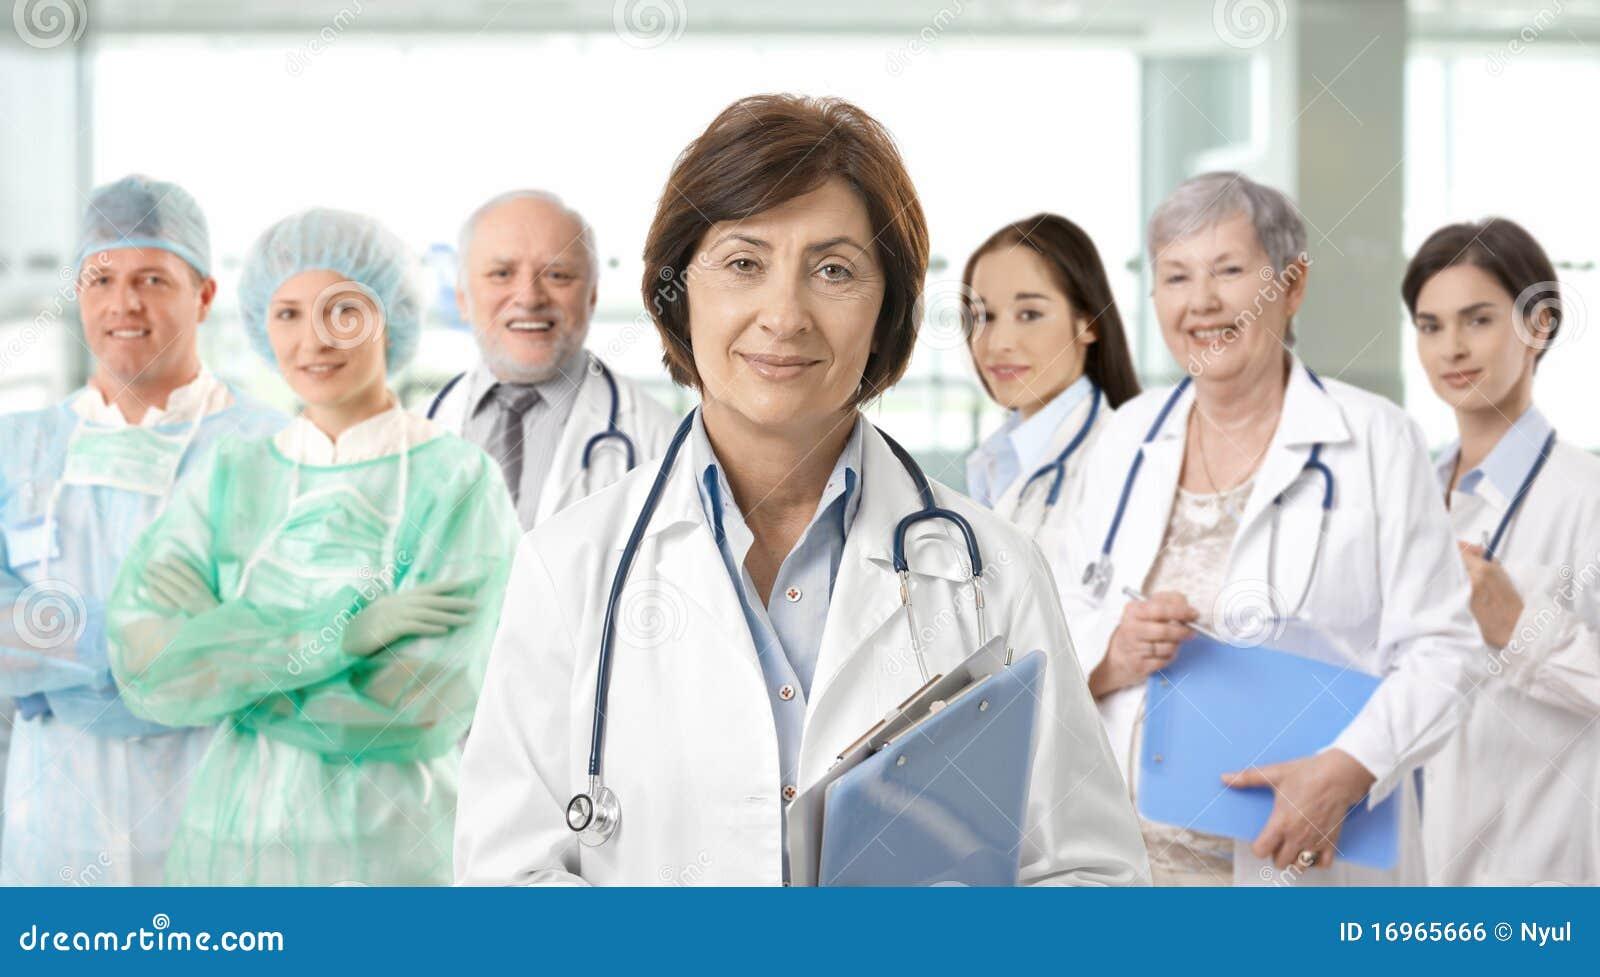 Online dating medical professionals